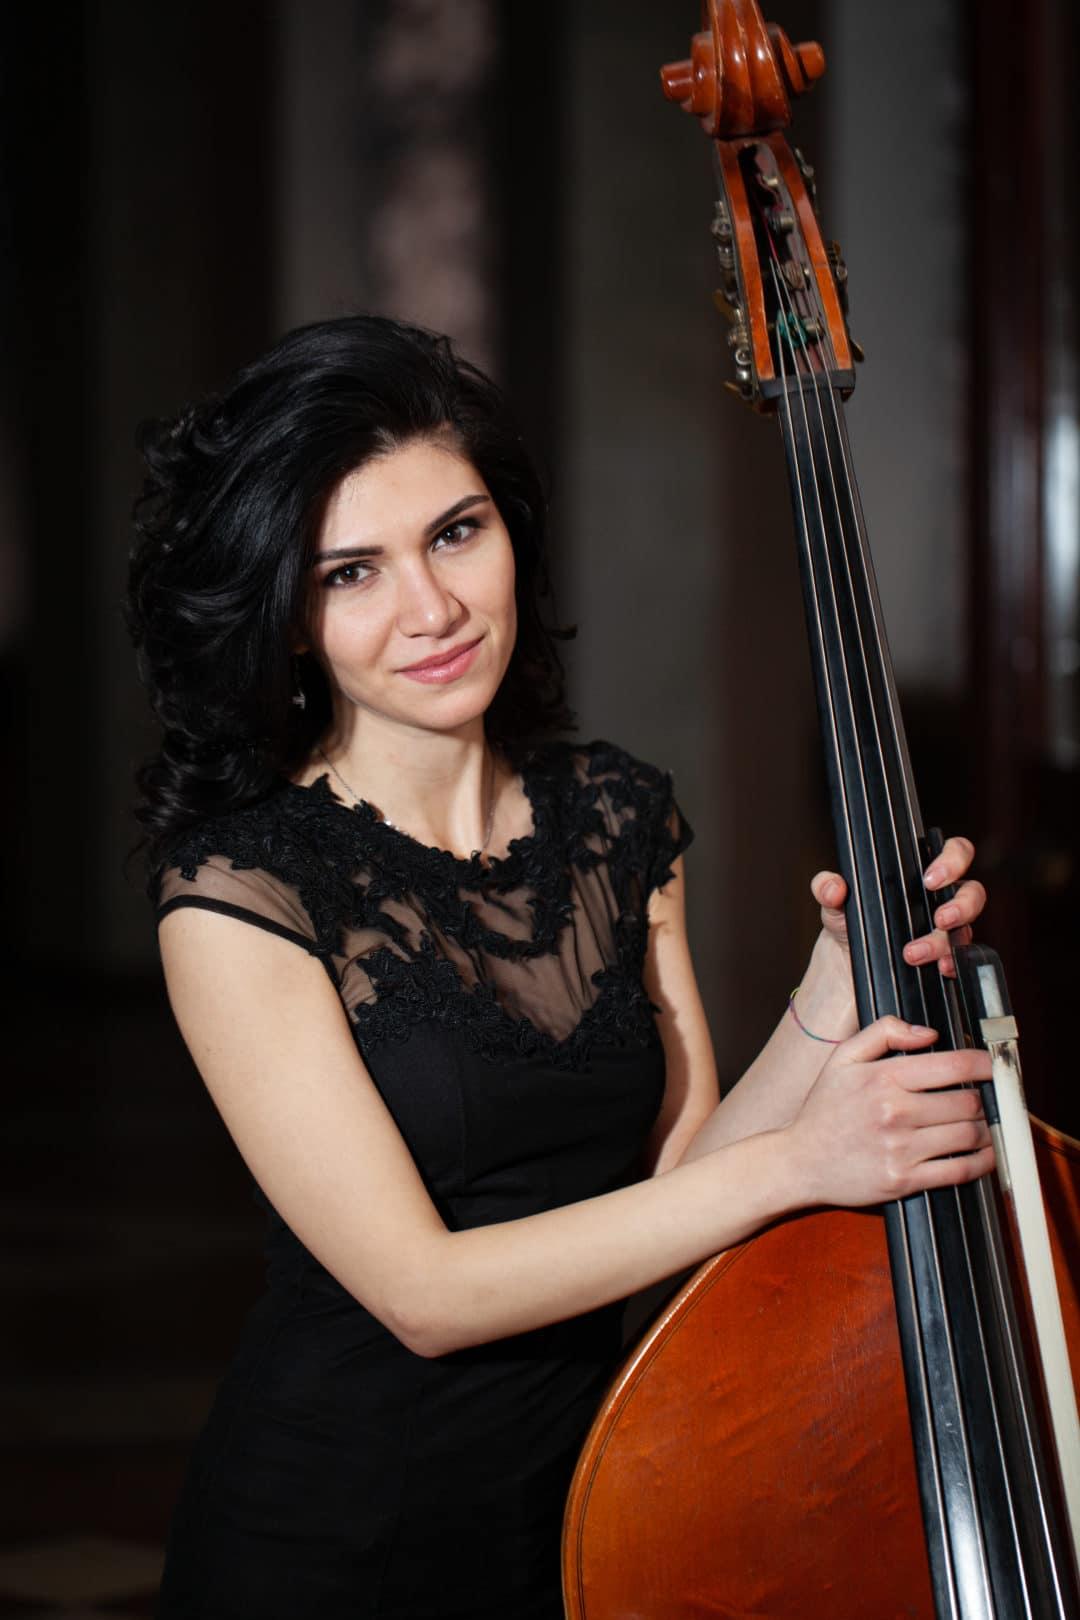 Ева Геворгян